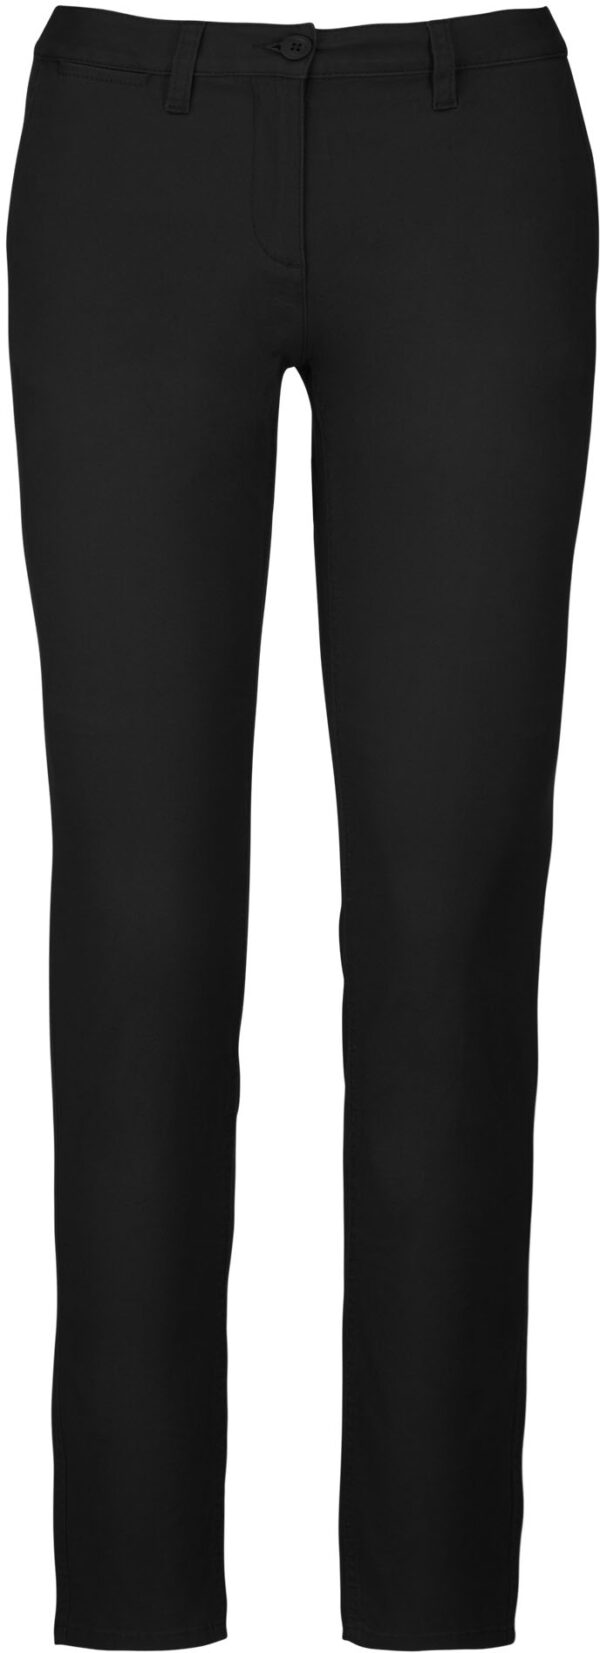 Pantalon Femme Blanc noir